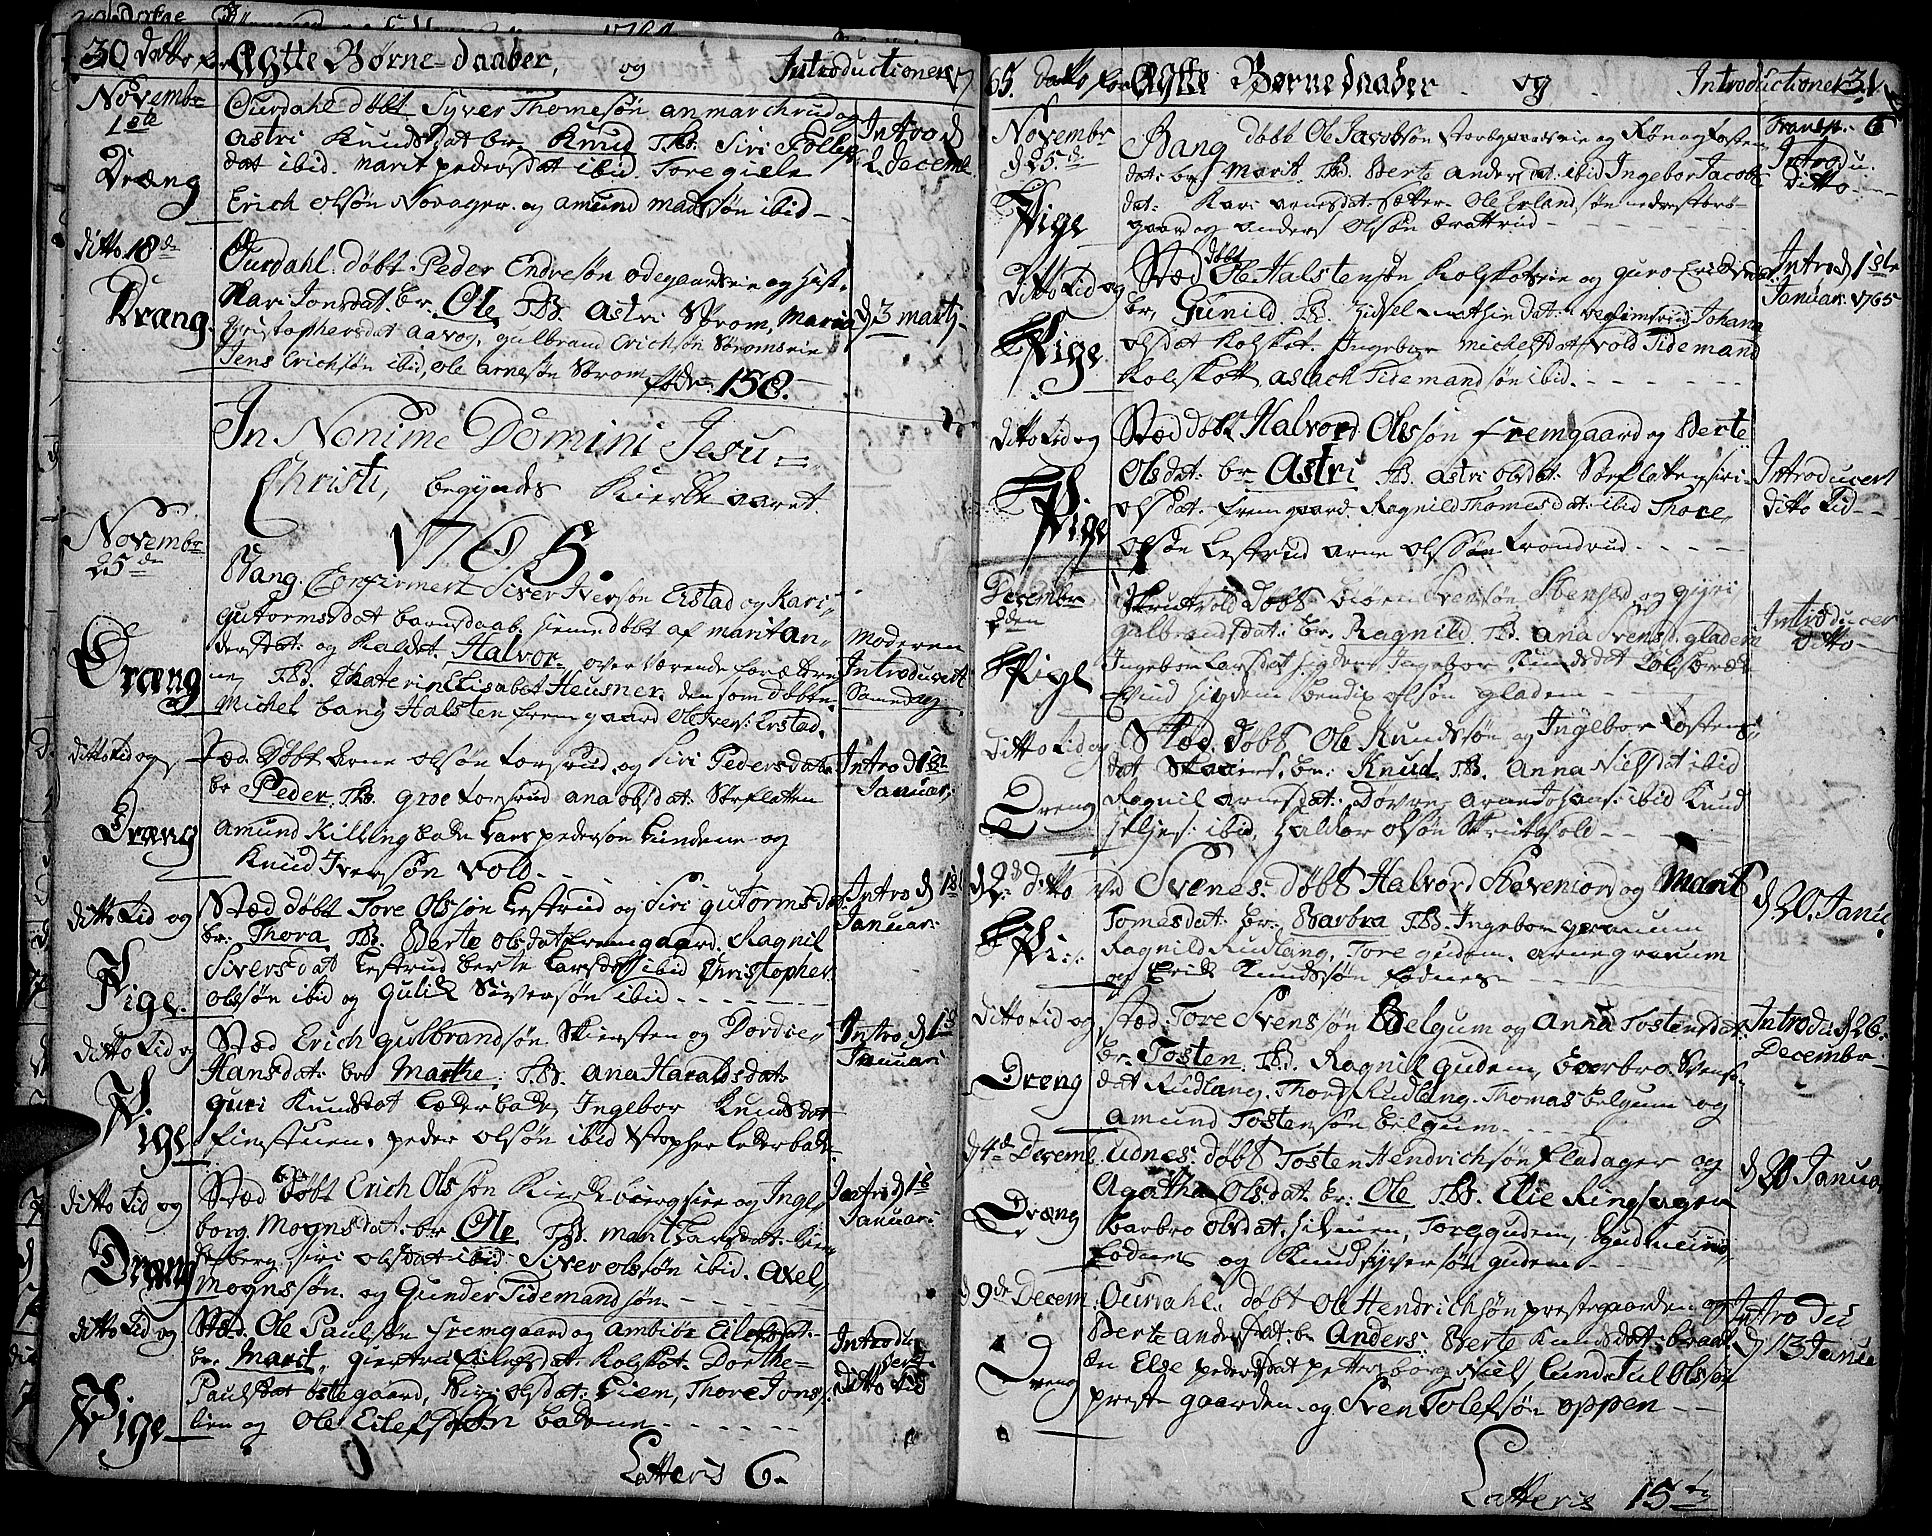 SAH, Aurdal prestekontor, Ministerialbok nr. 5, 1763-1781, s. 30-31